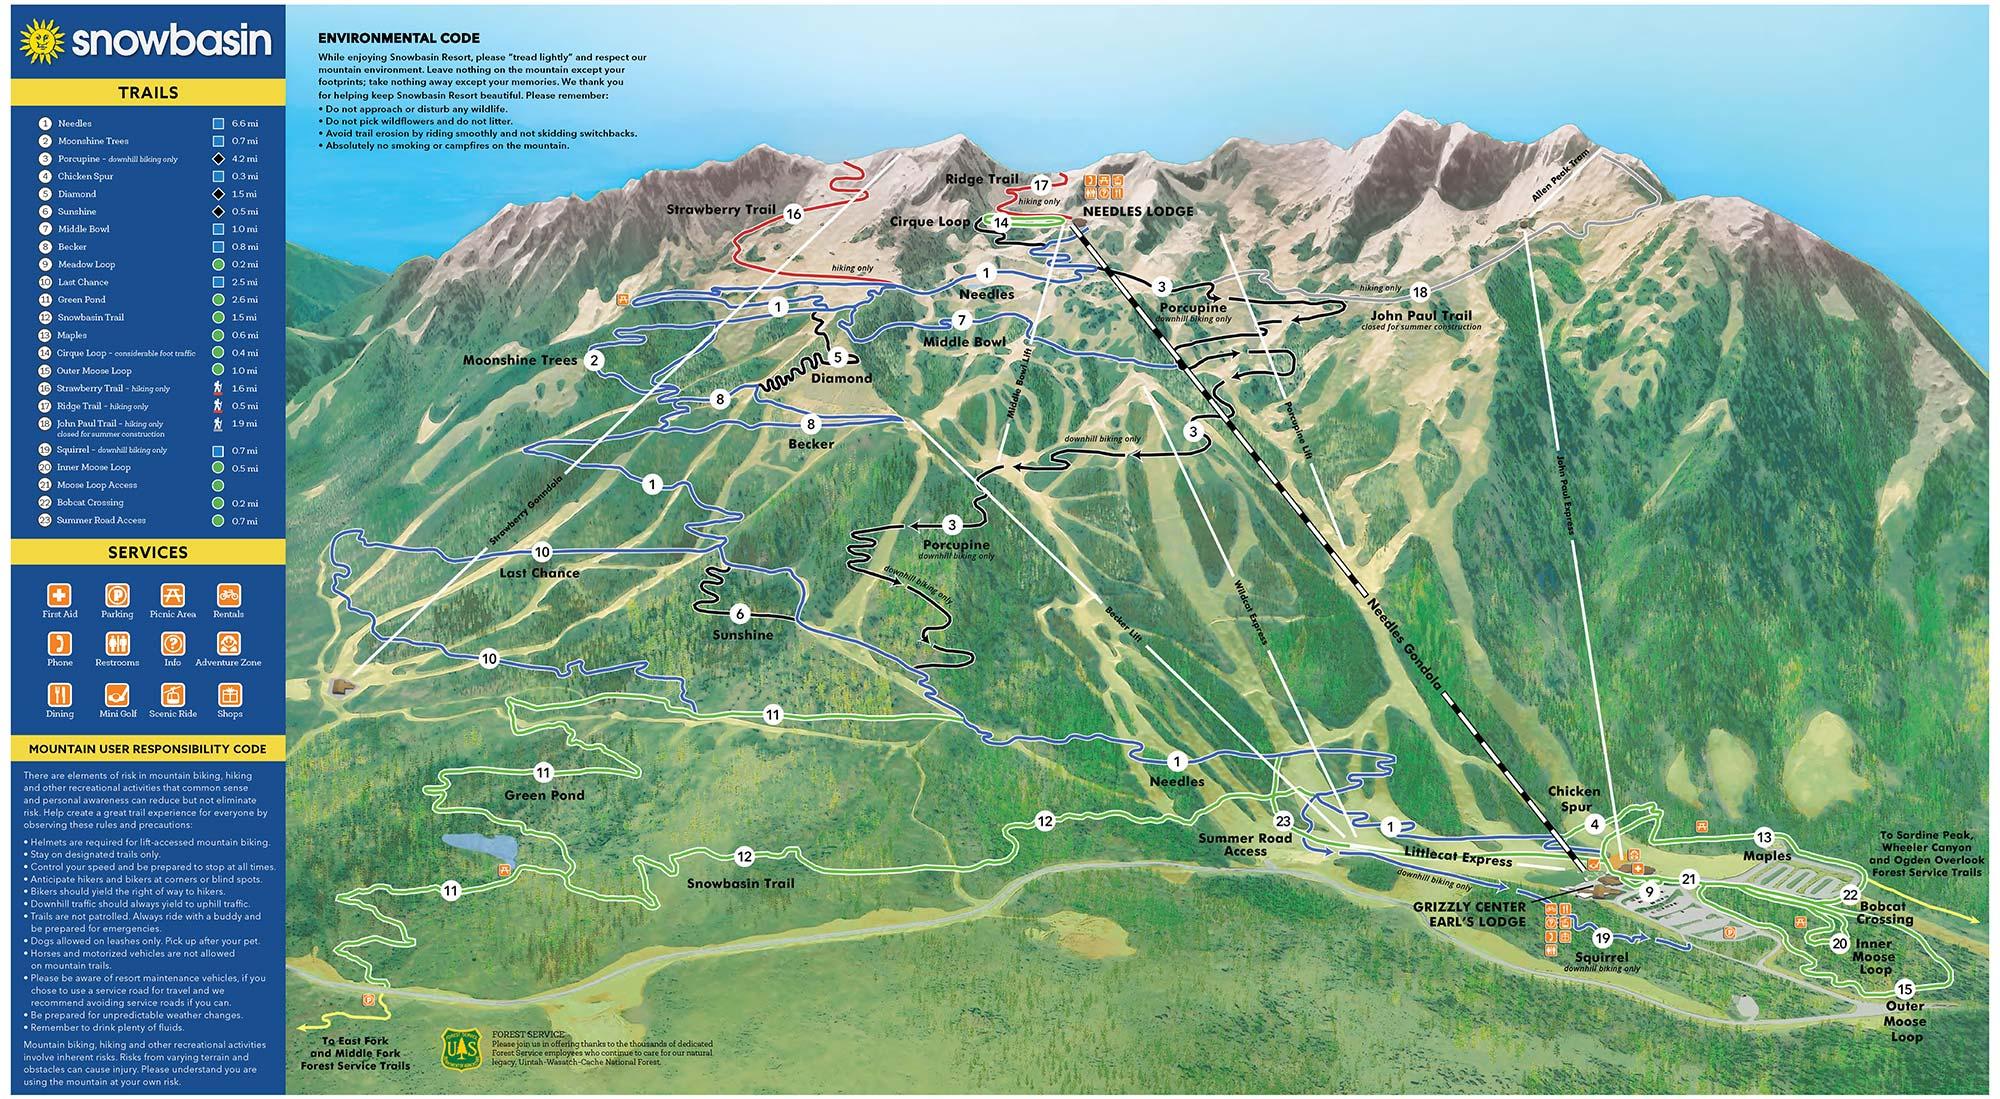 Snowbasin 2019 Summer Trail Map